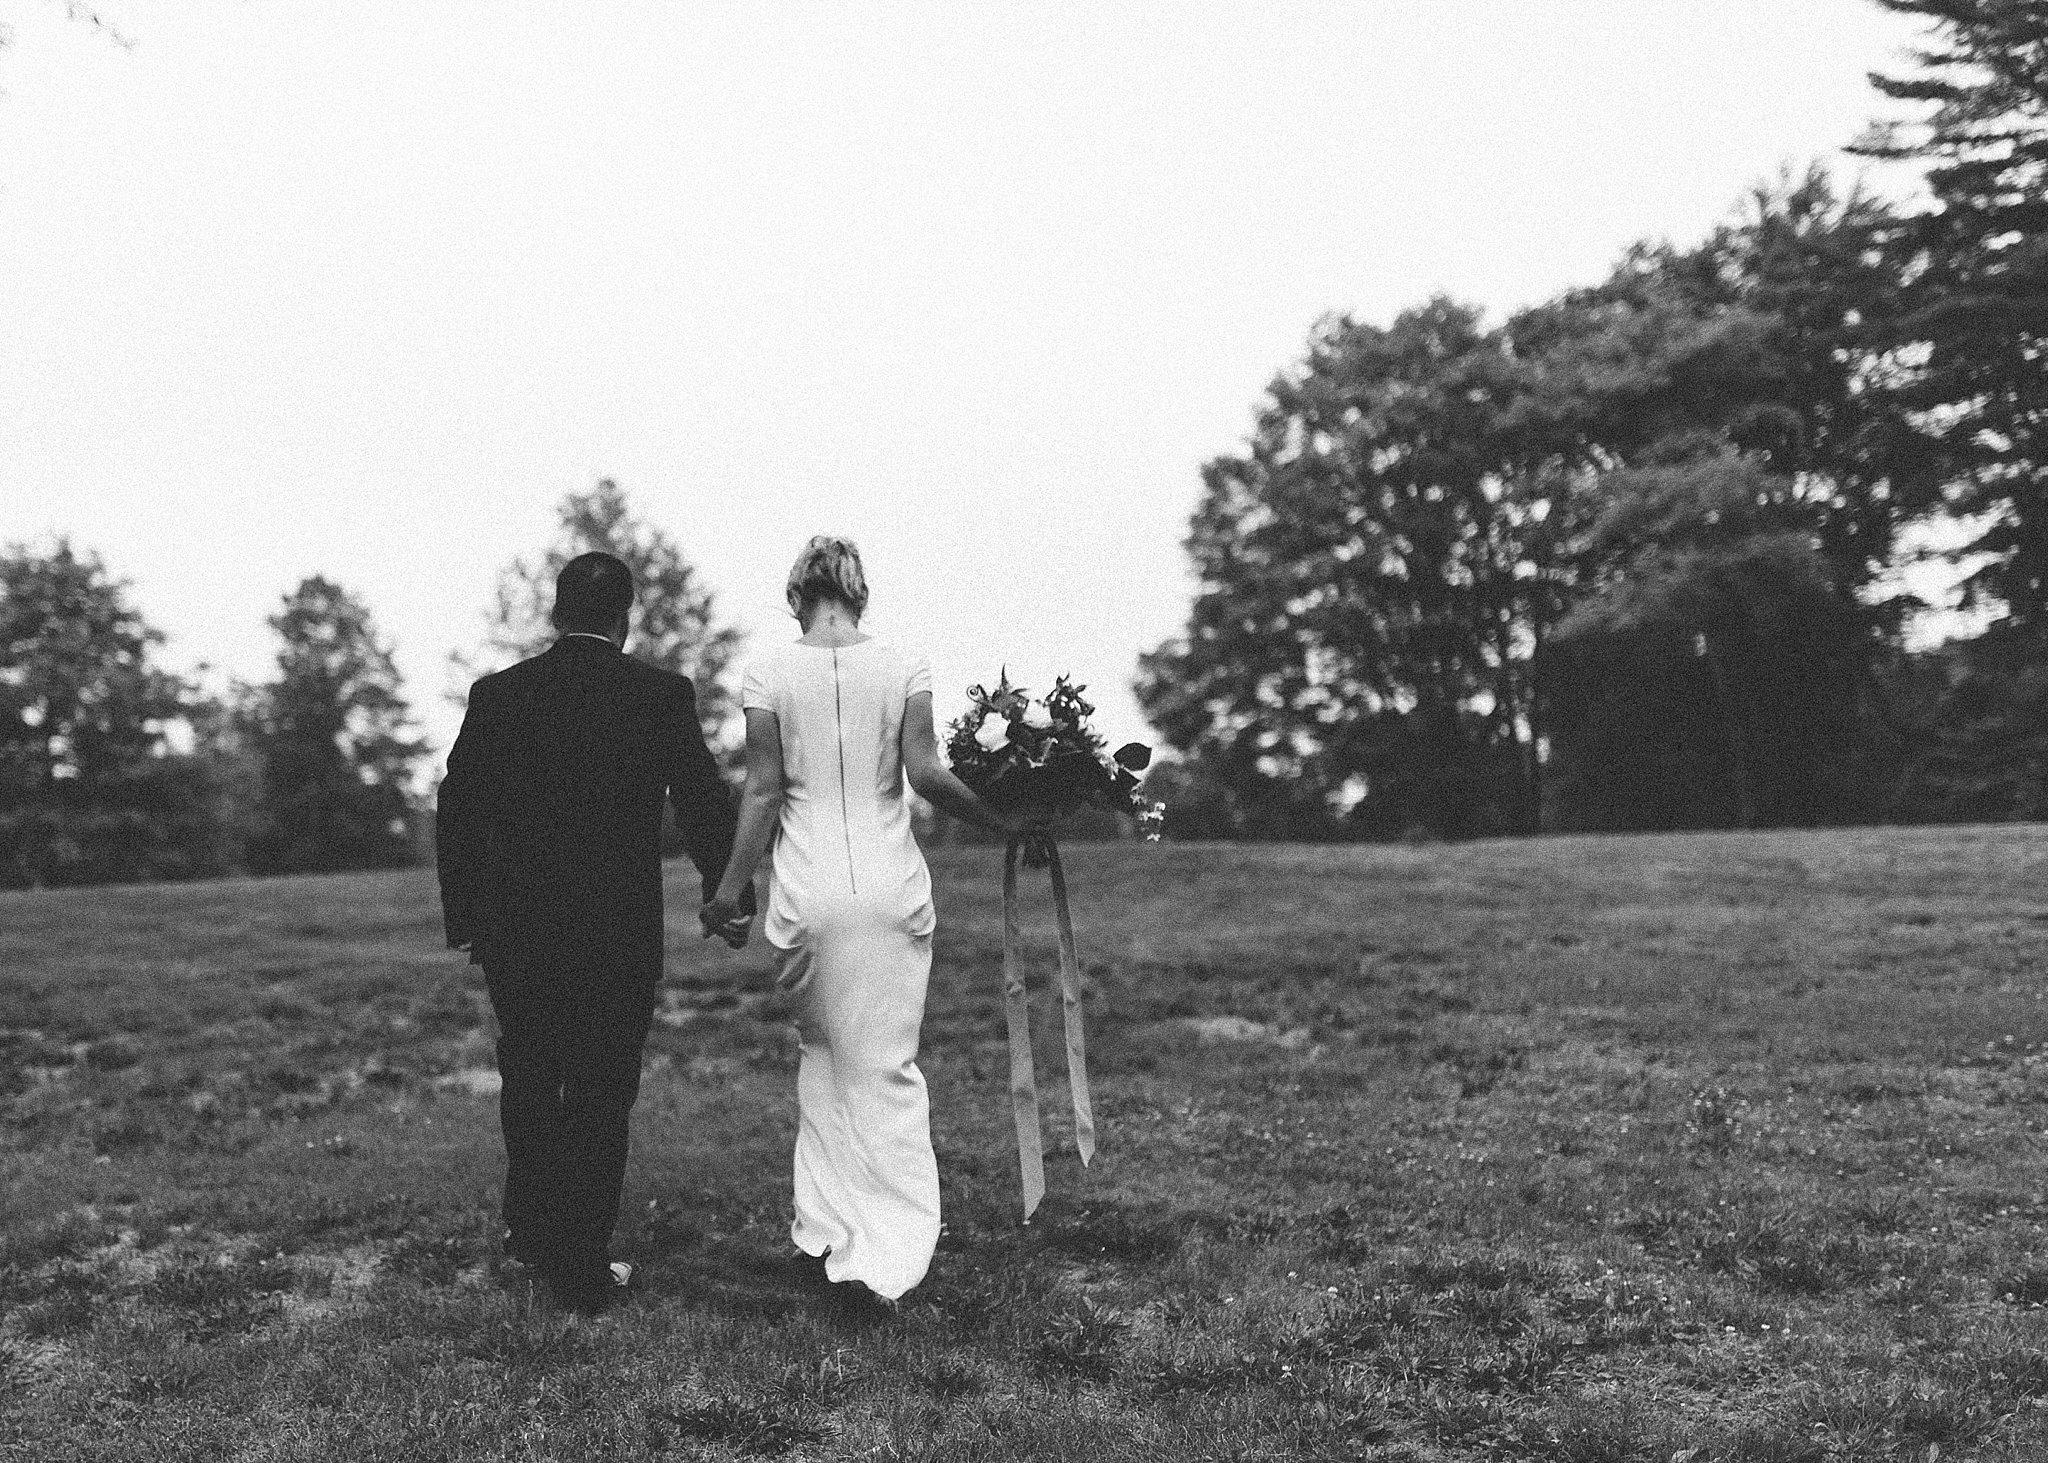 mountain weddings in new england.jpg